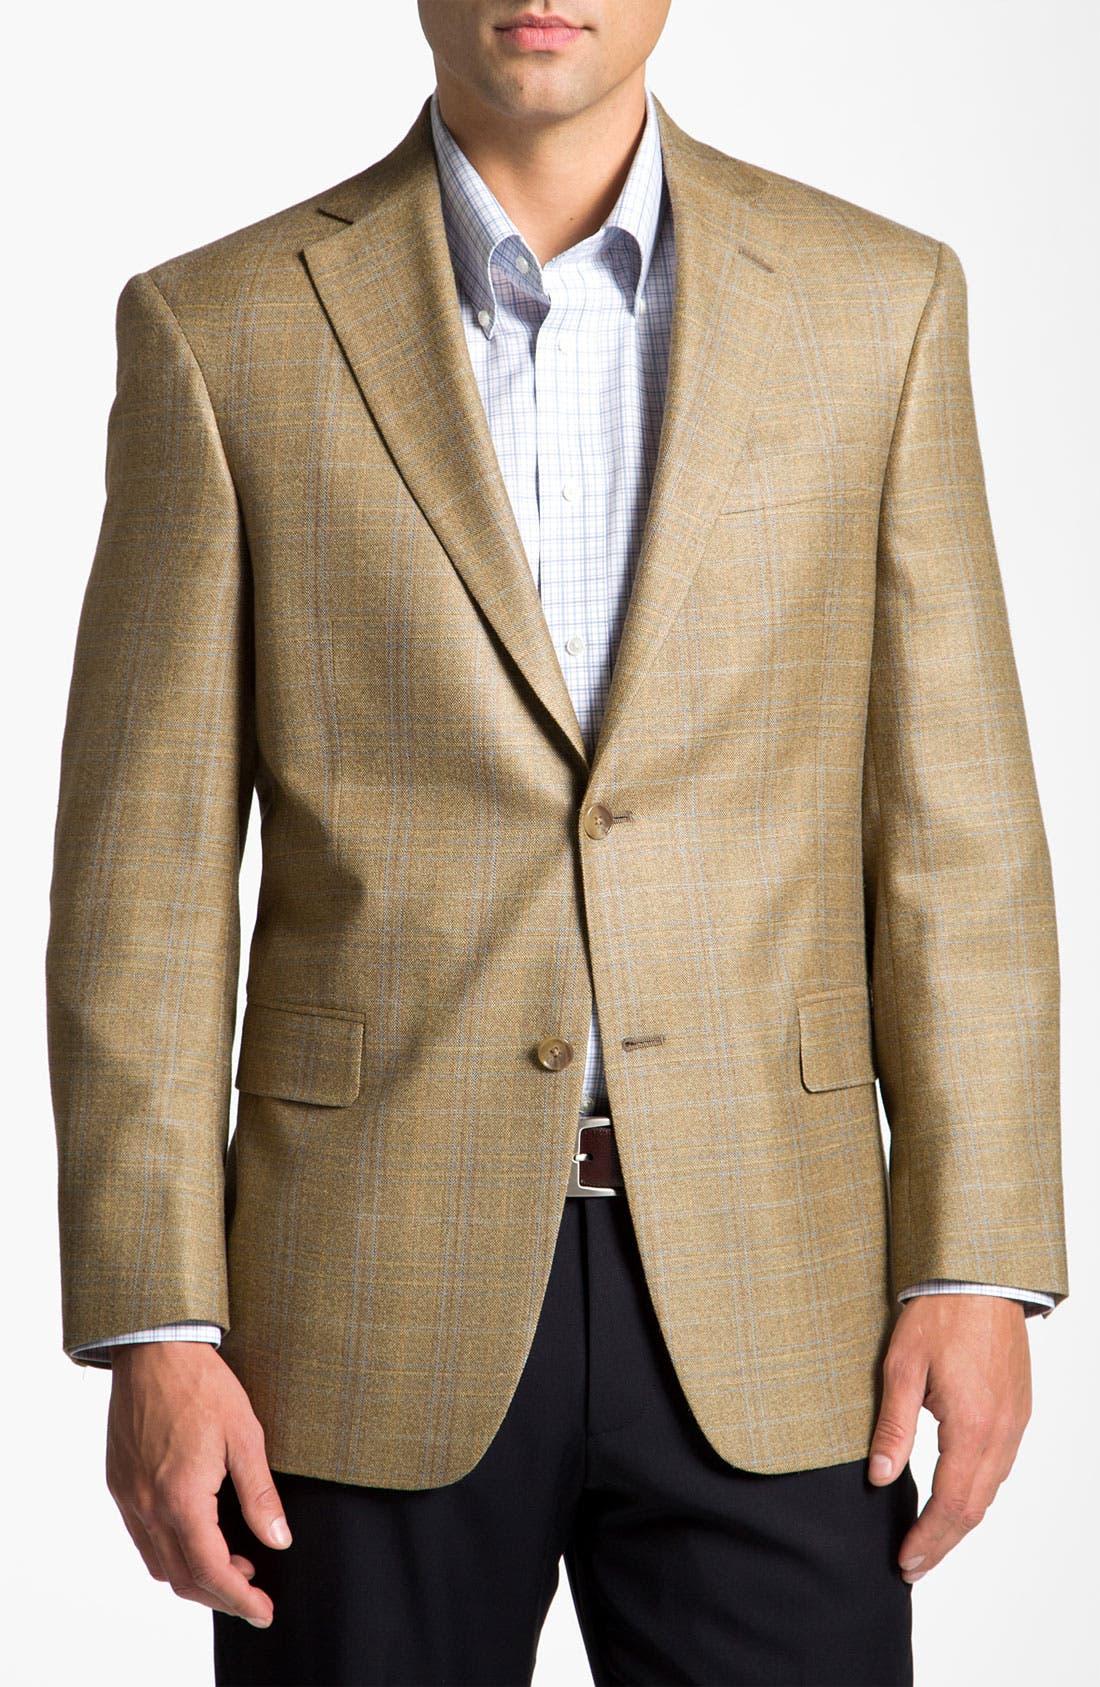 Alternate Image 1 Selected - Hart Schaffner Marx Brown Plaid Wool Sportcoat